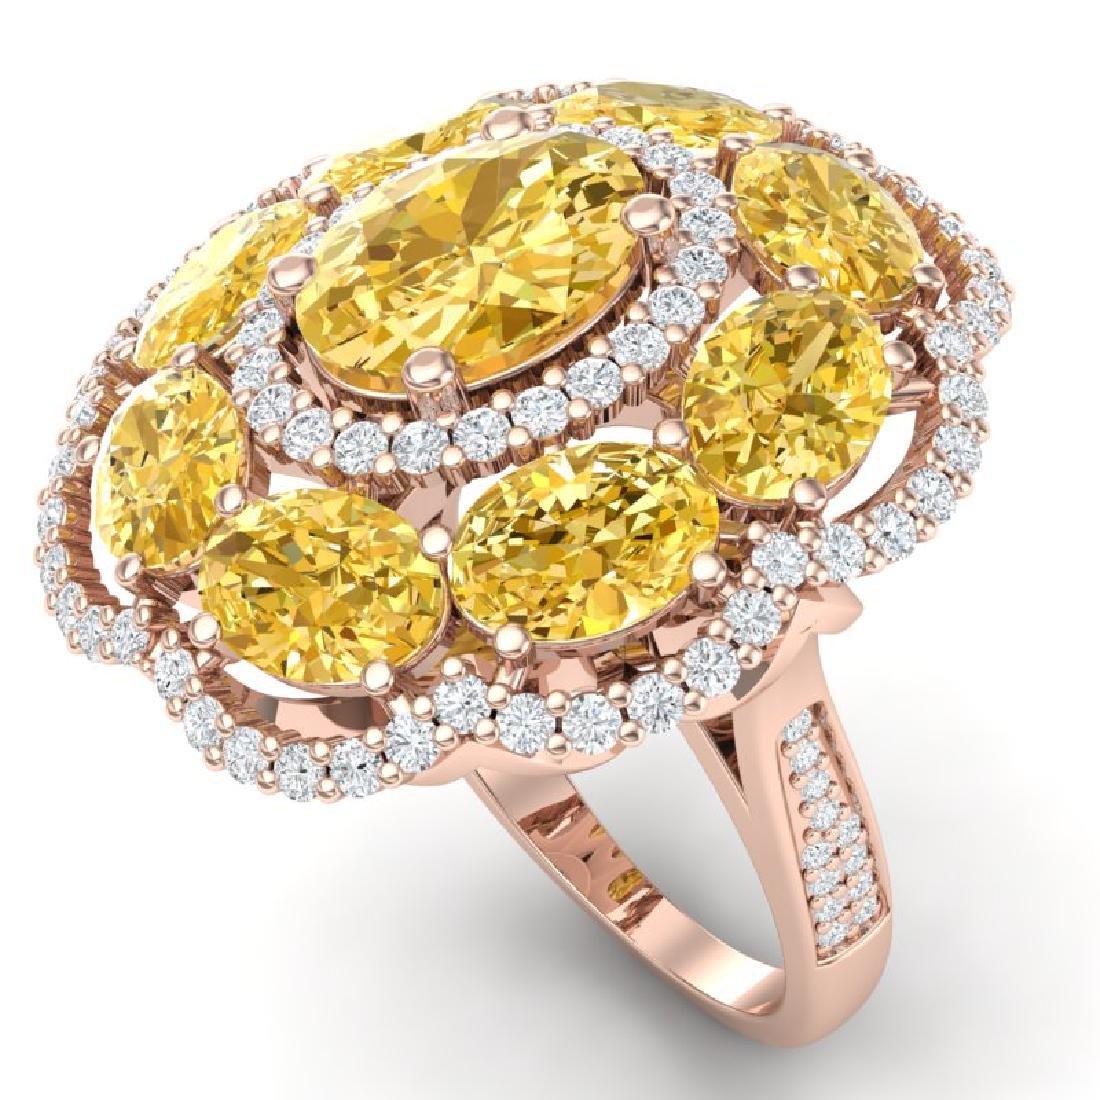 13.71 CTW Royalty Canary Citrine & VS Diamond Ring 18K